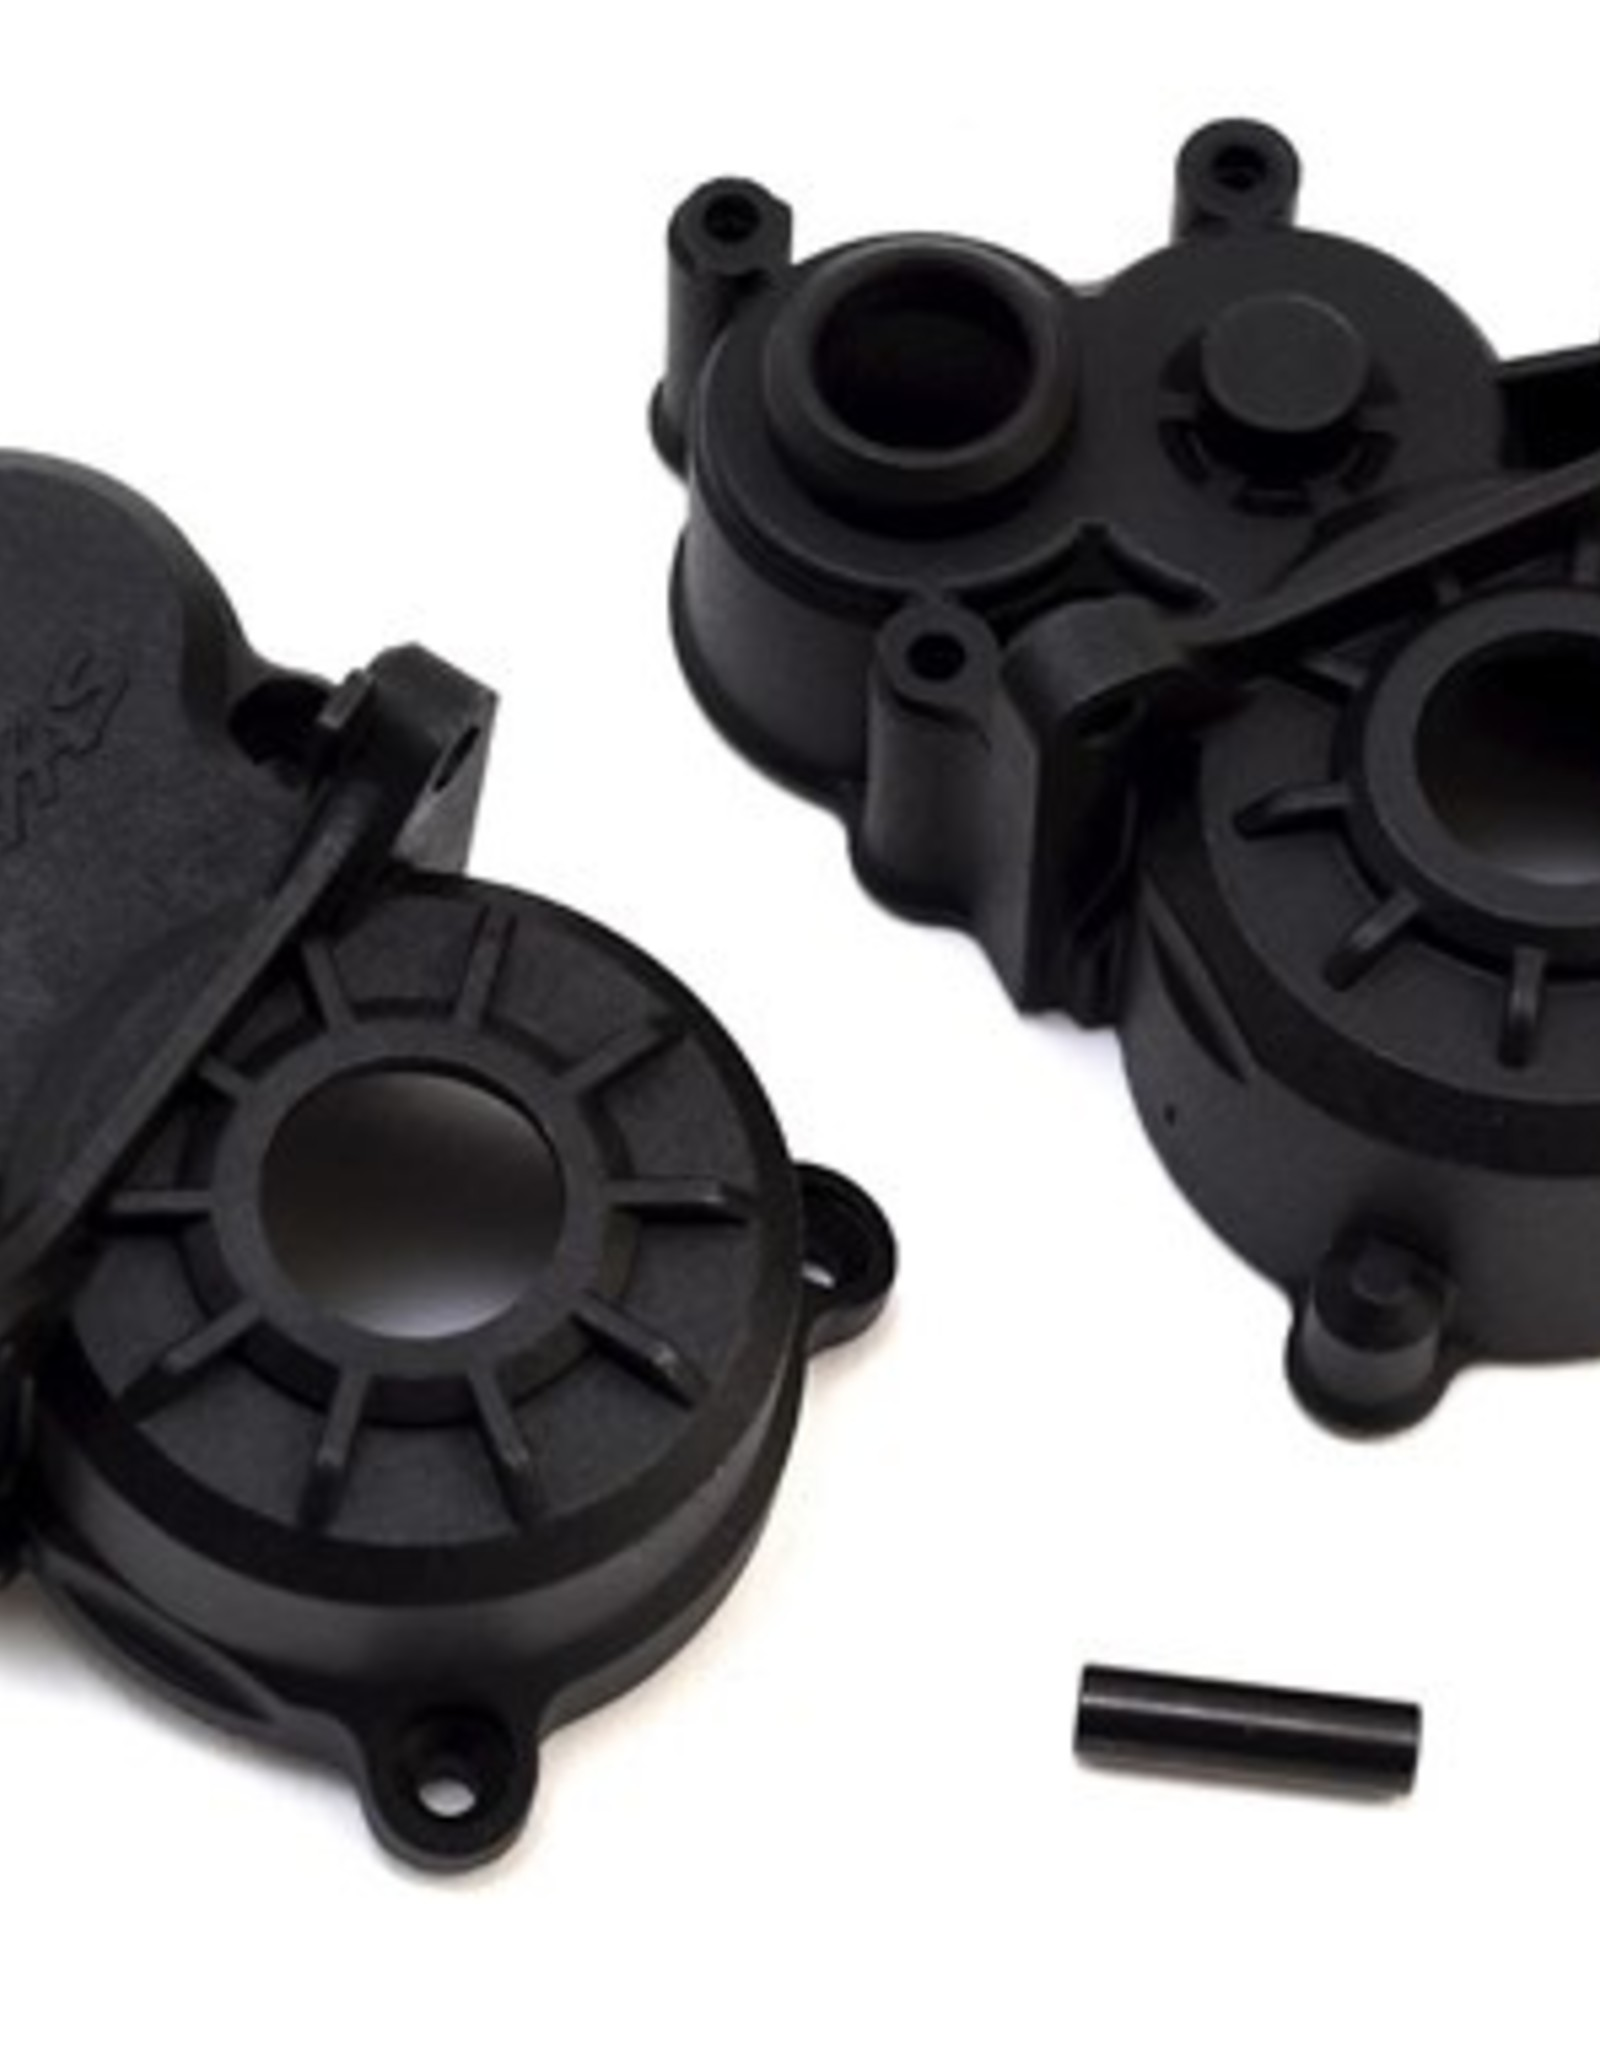 Traxxas Traxxas E-Revo 2.0 Gearbox halves (front & rear)/ idler gear shaft